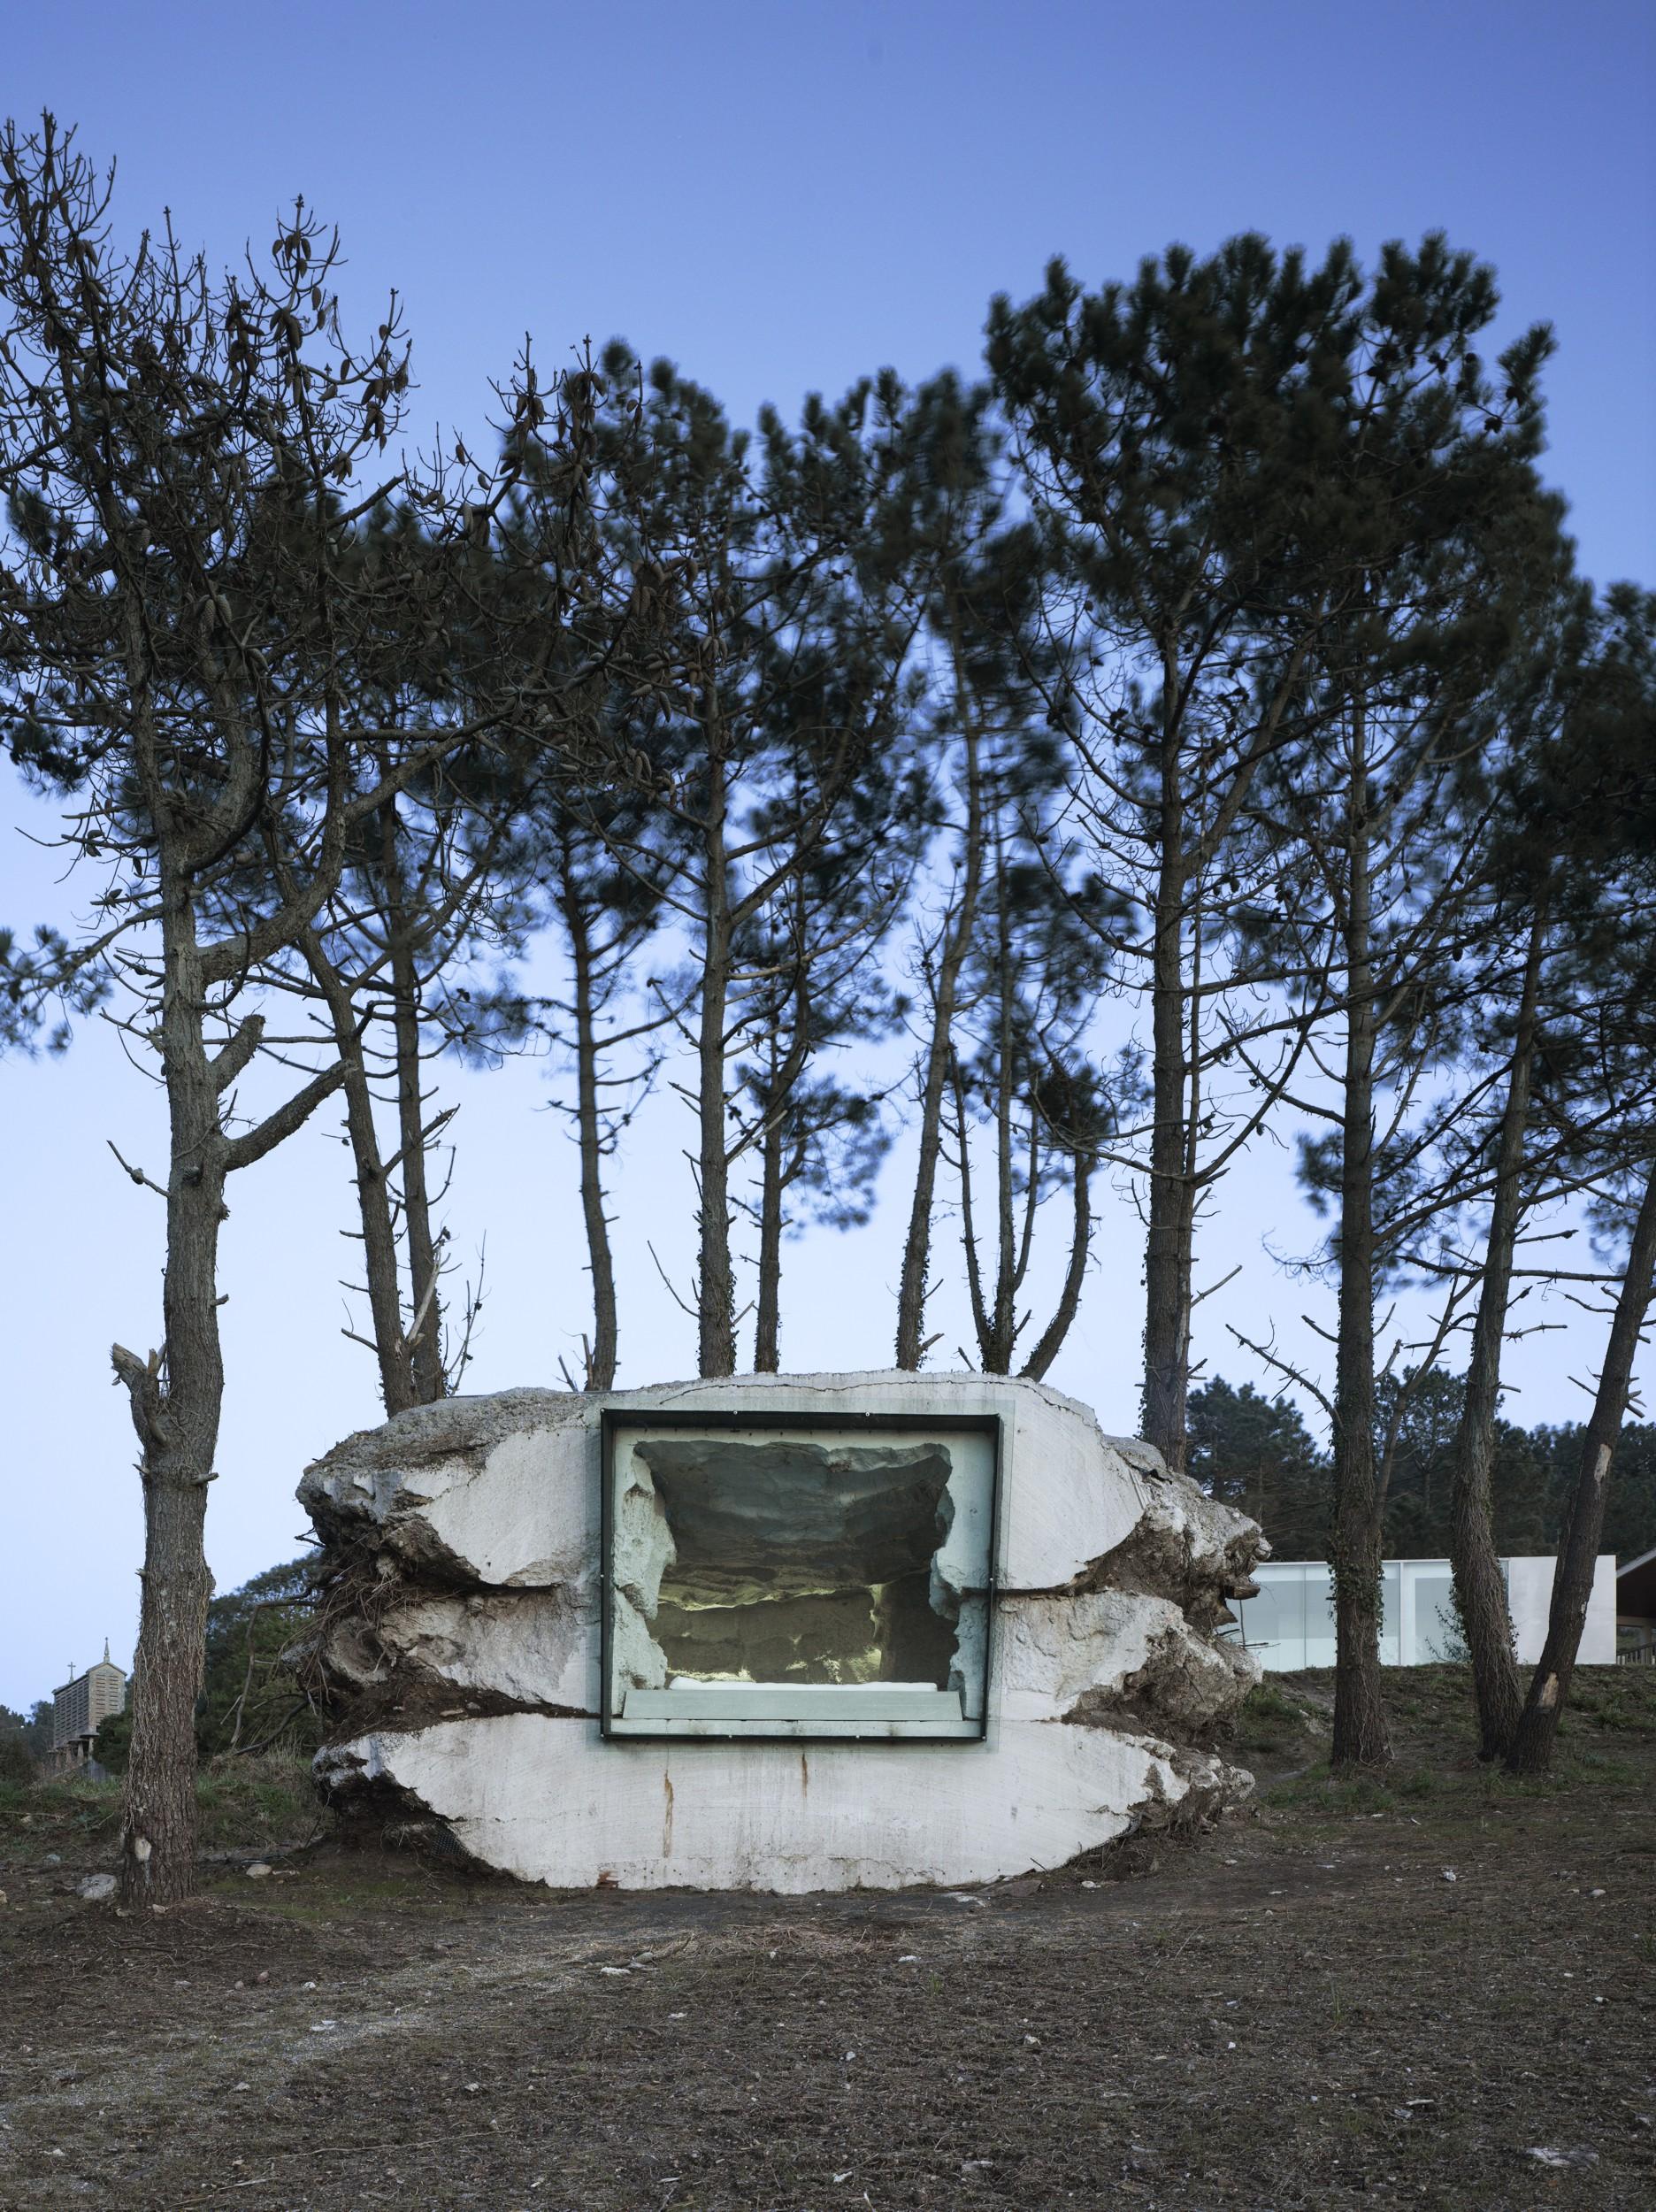 Truffle-Spain-by-Ensamble-Studio-09.jpg